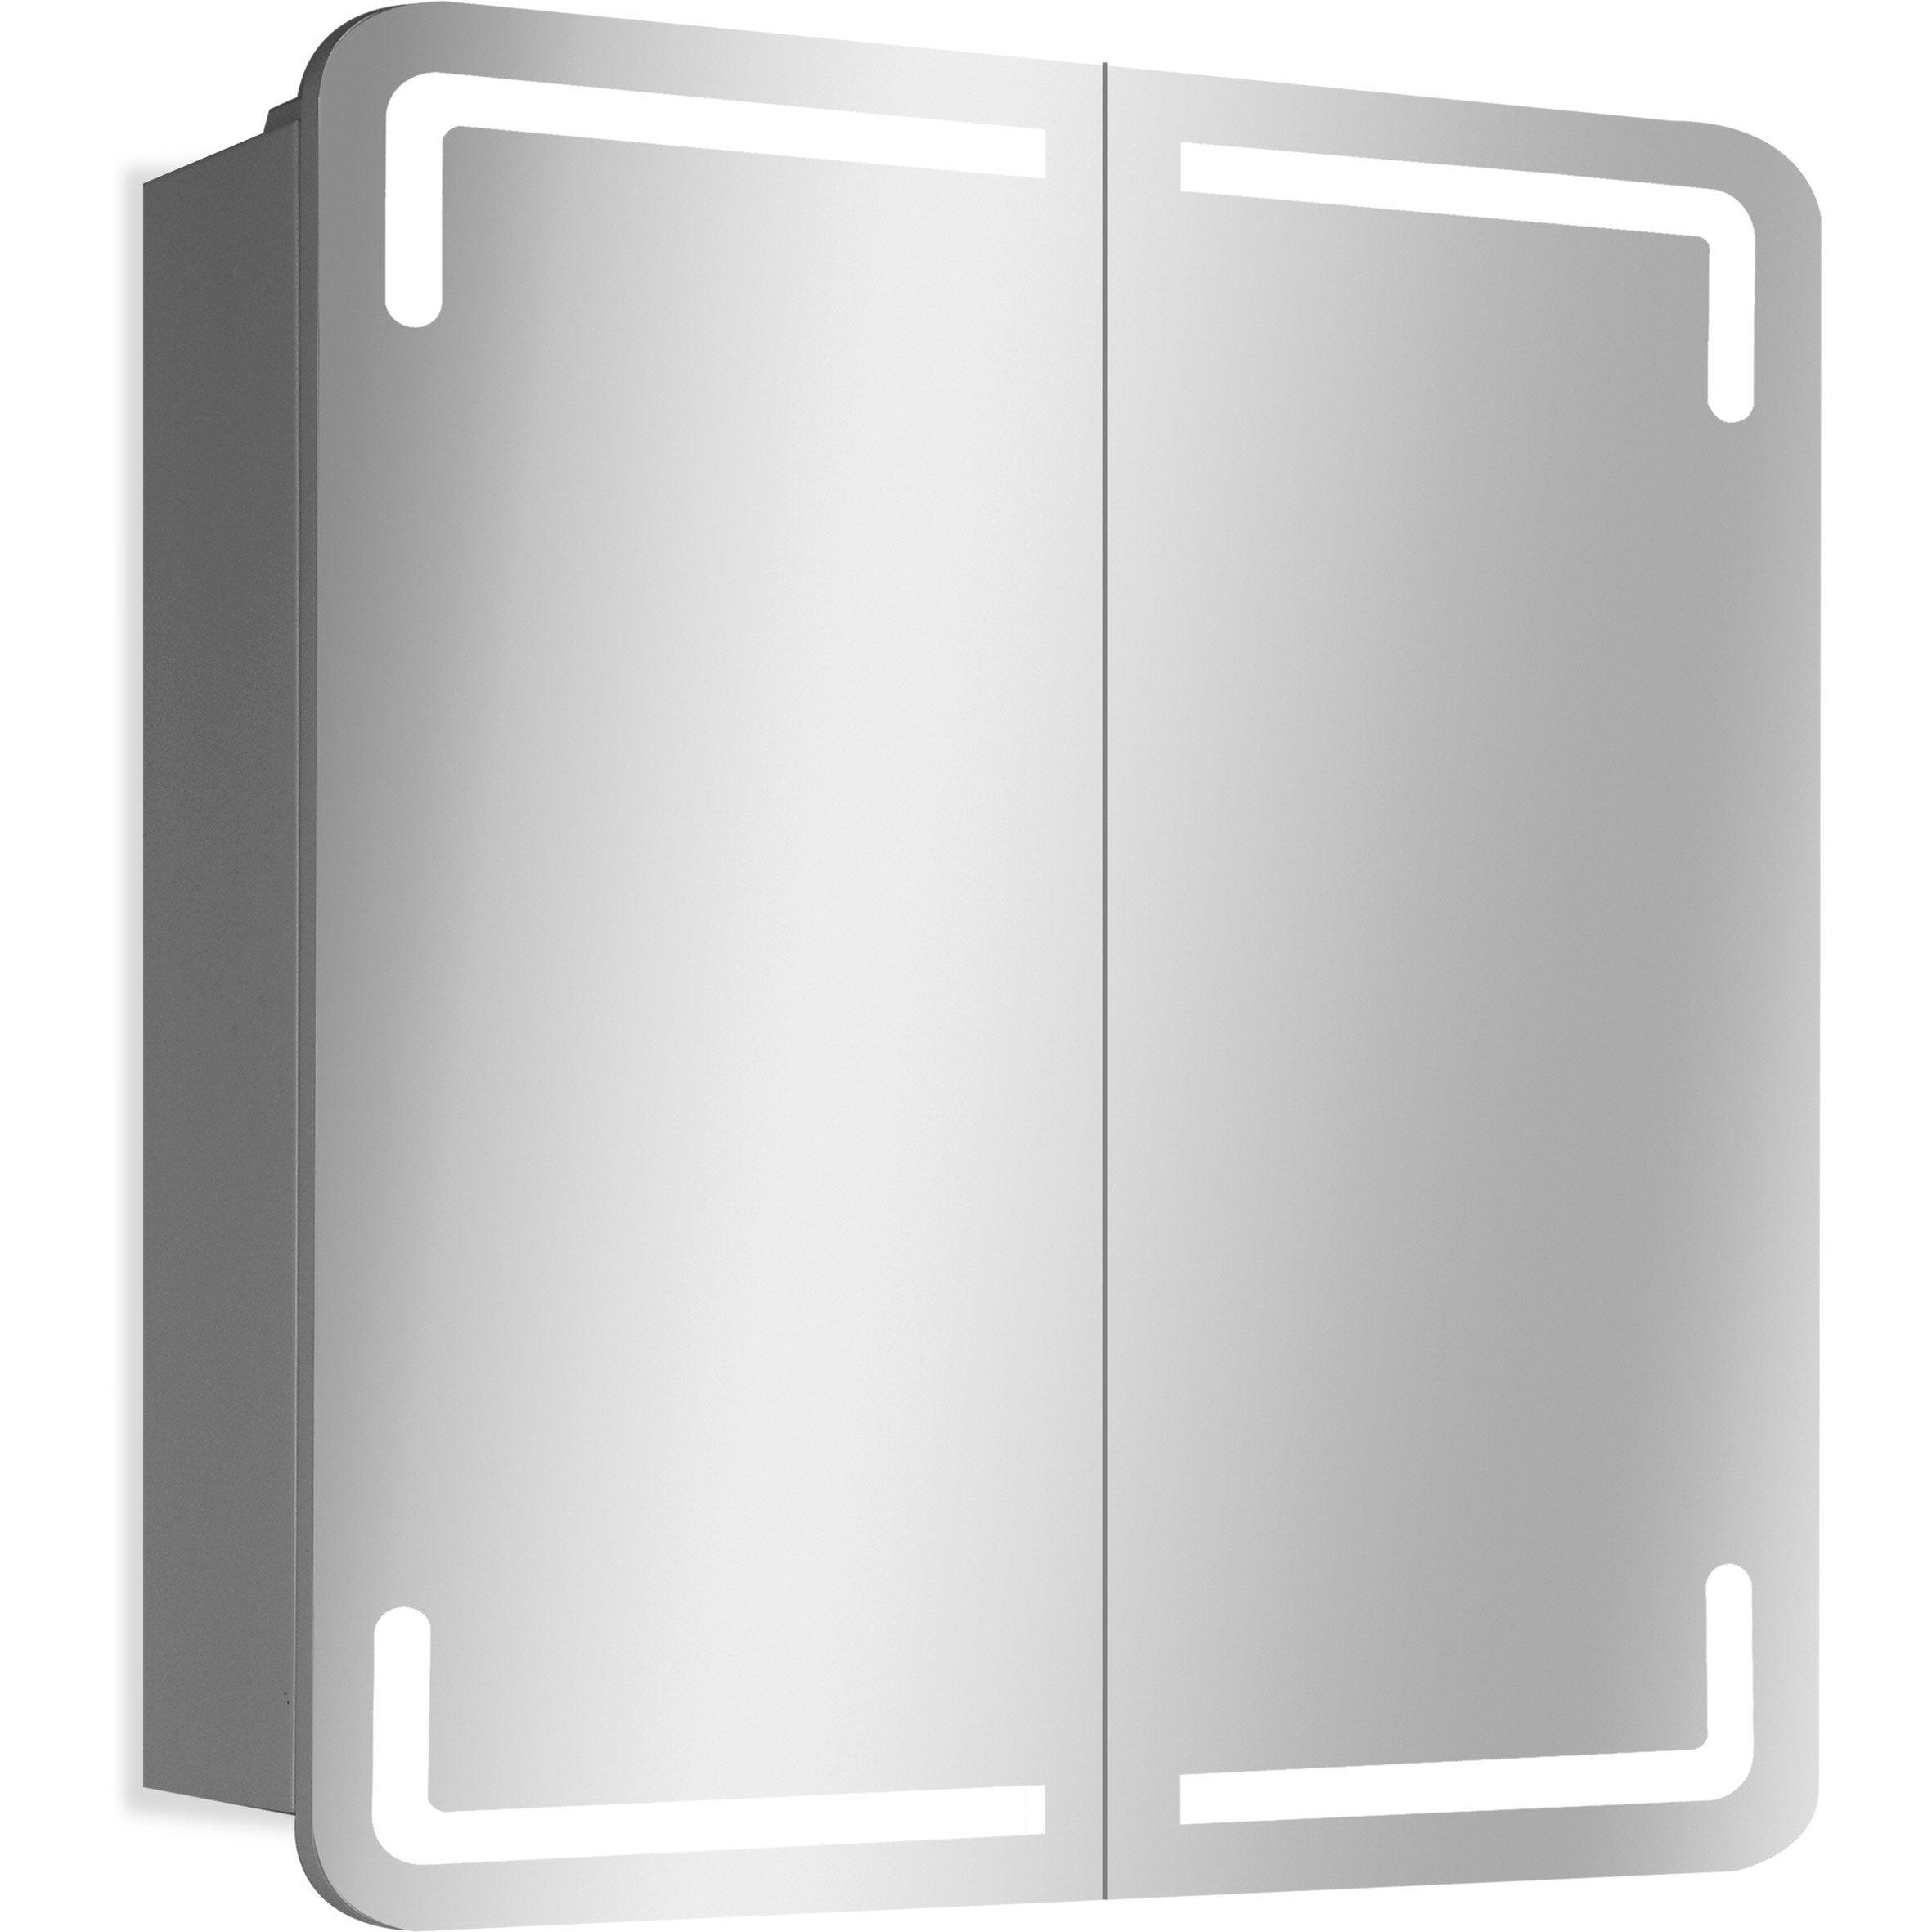 Armoire led de toilette lumineuse l. 80 cm, blanc Estrella | Leroy Merlin